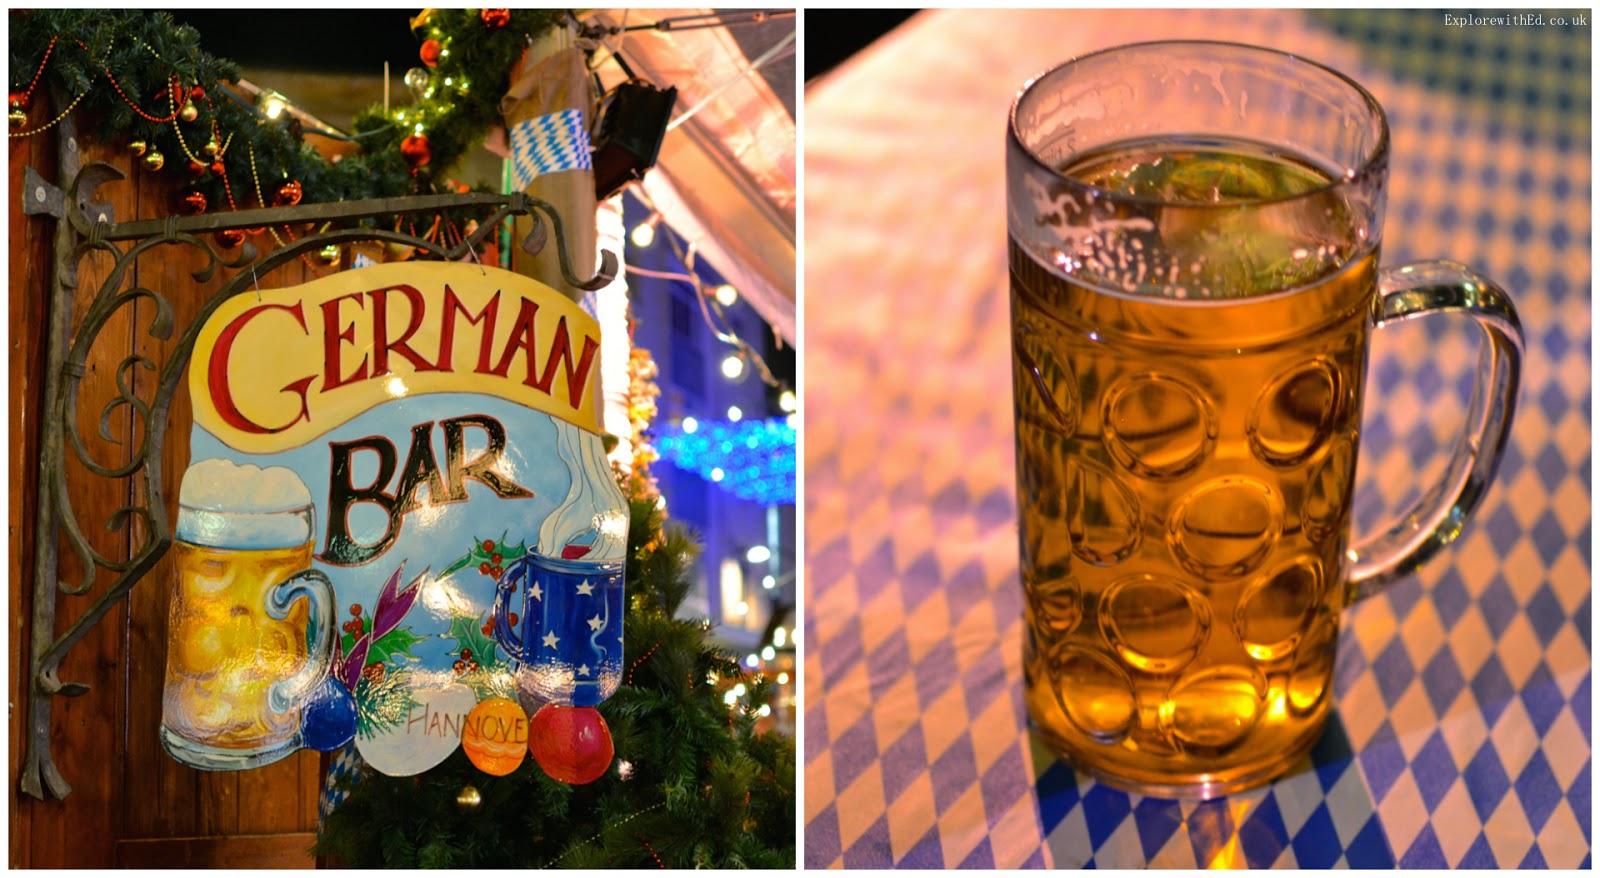 German Christmas Bar in Bristol